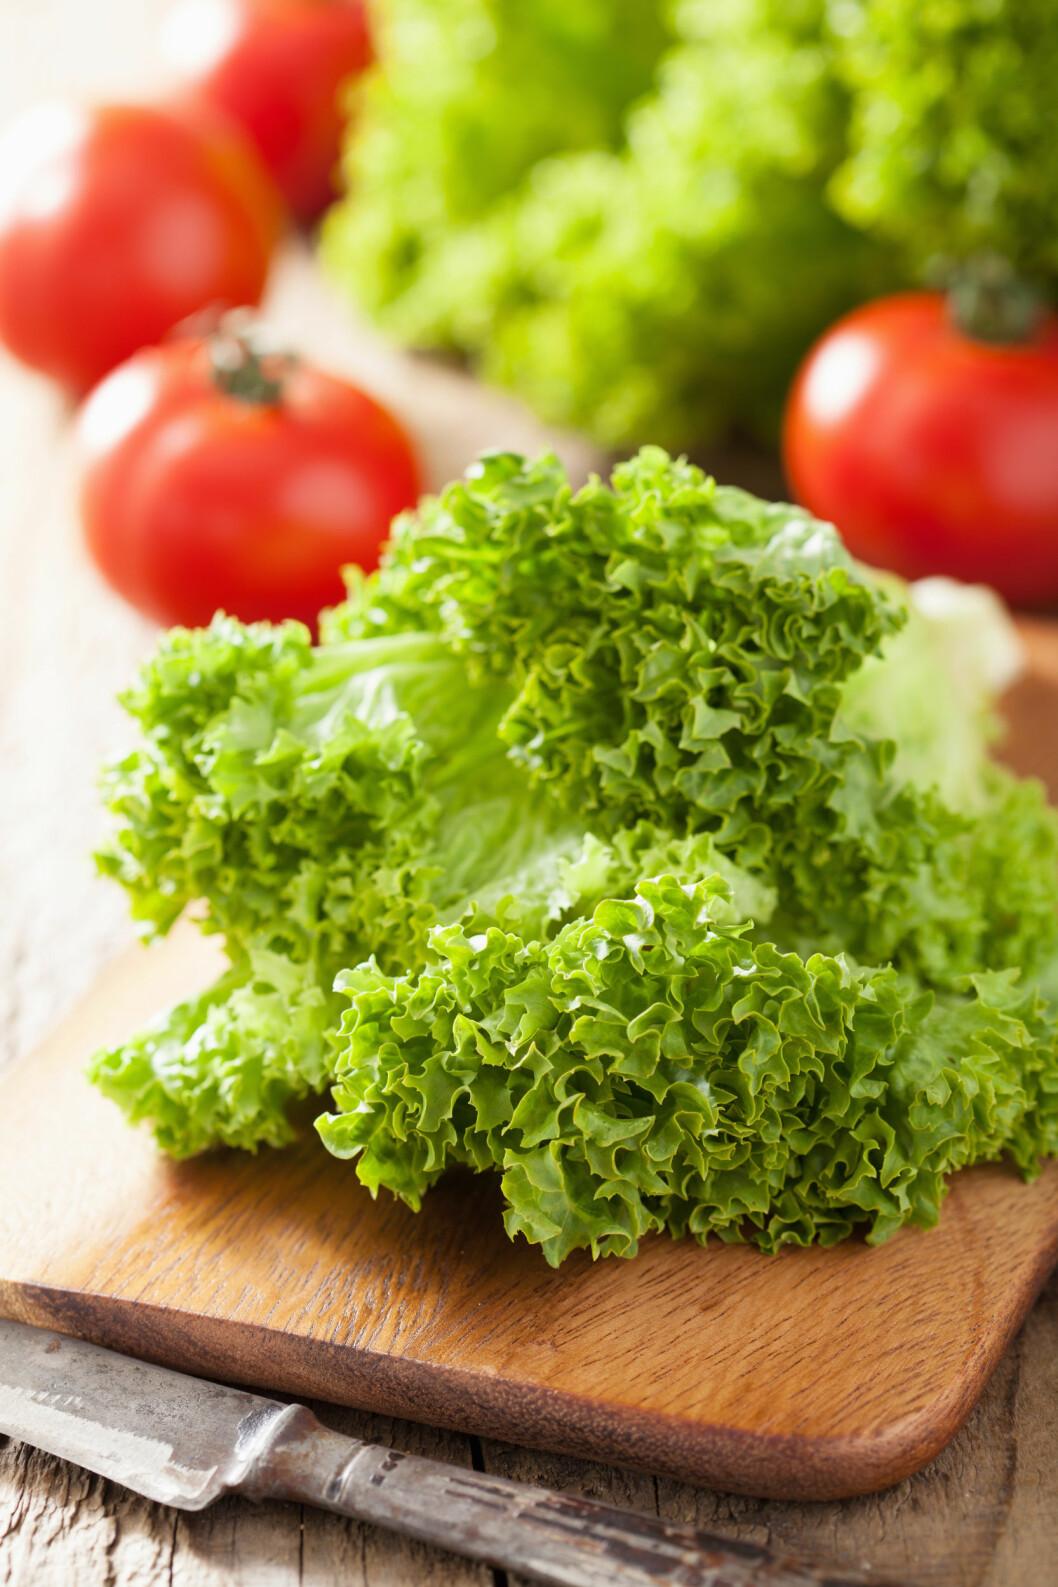 DROPP KNIVEN: Noen typer salat bør du mye heller rive opp.  Foto: dusk - Fotolia